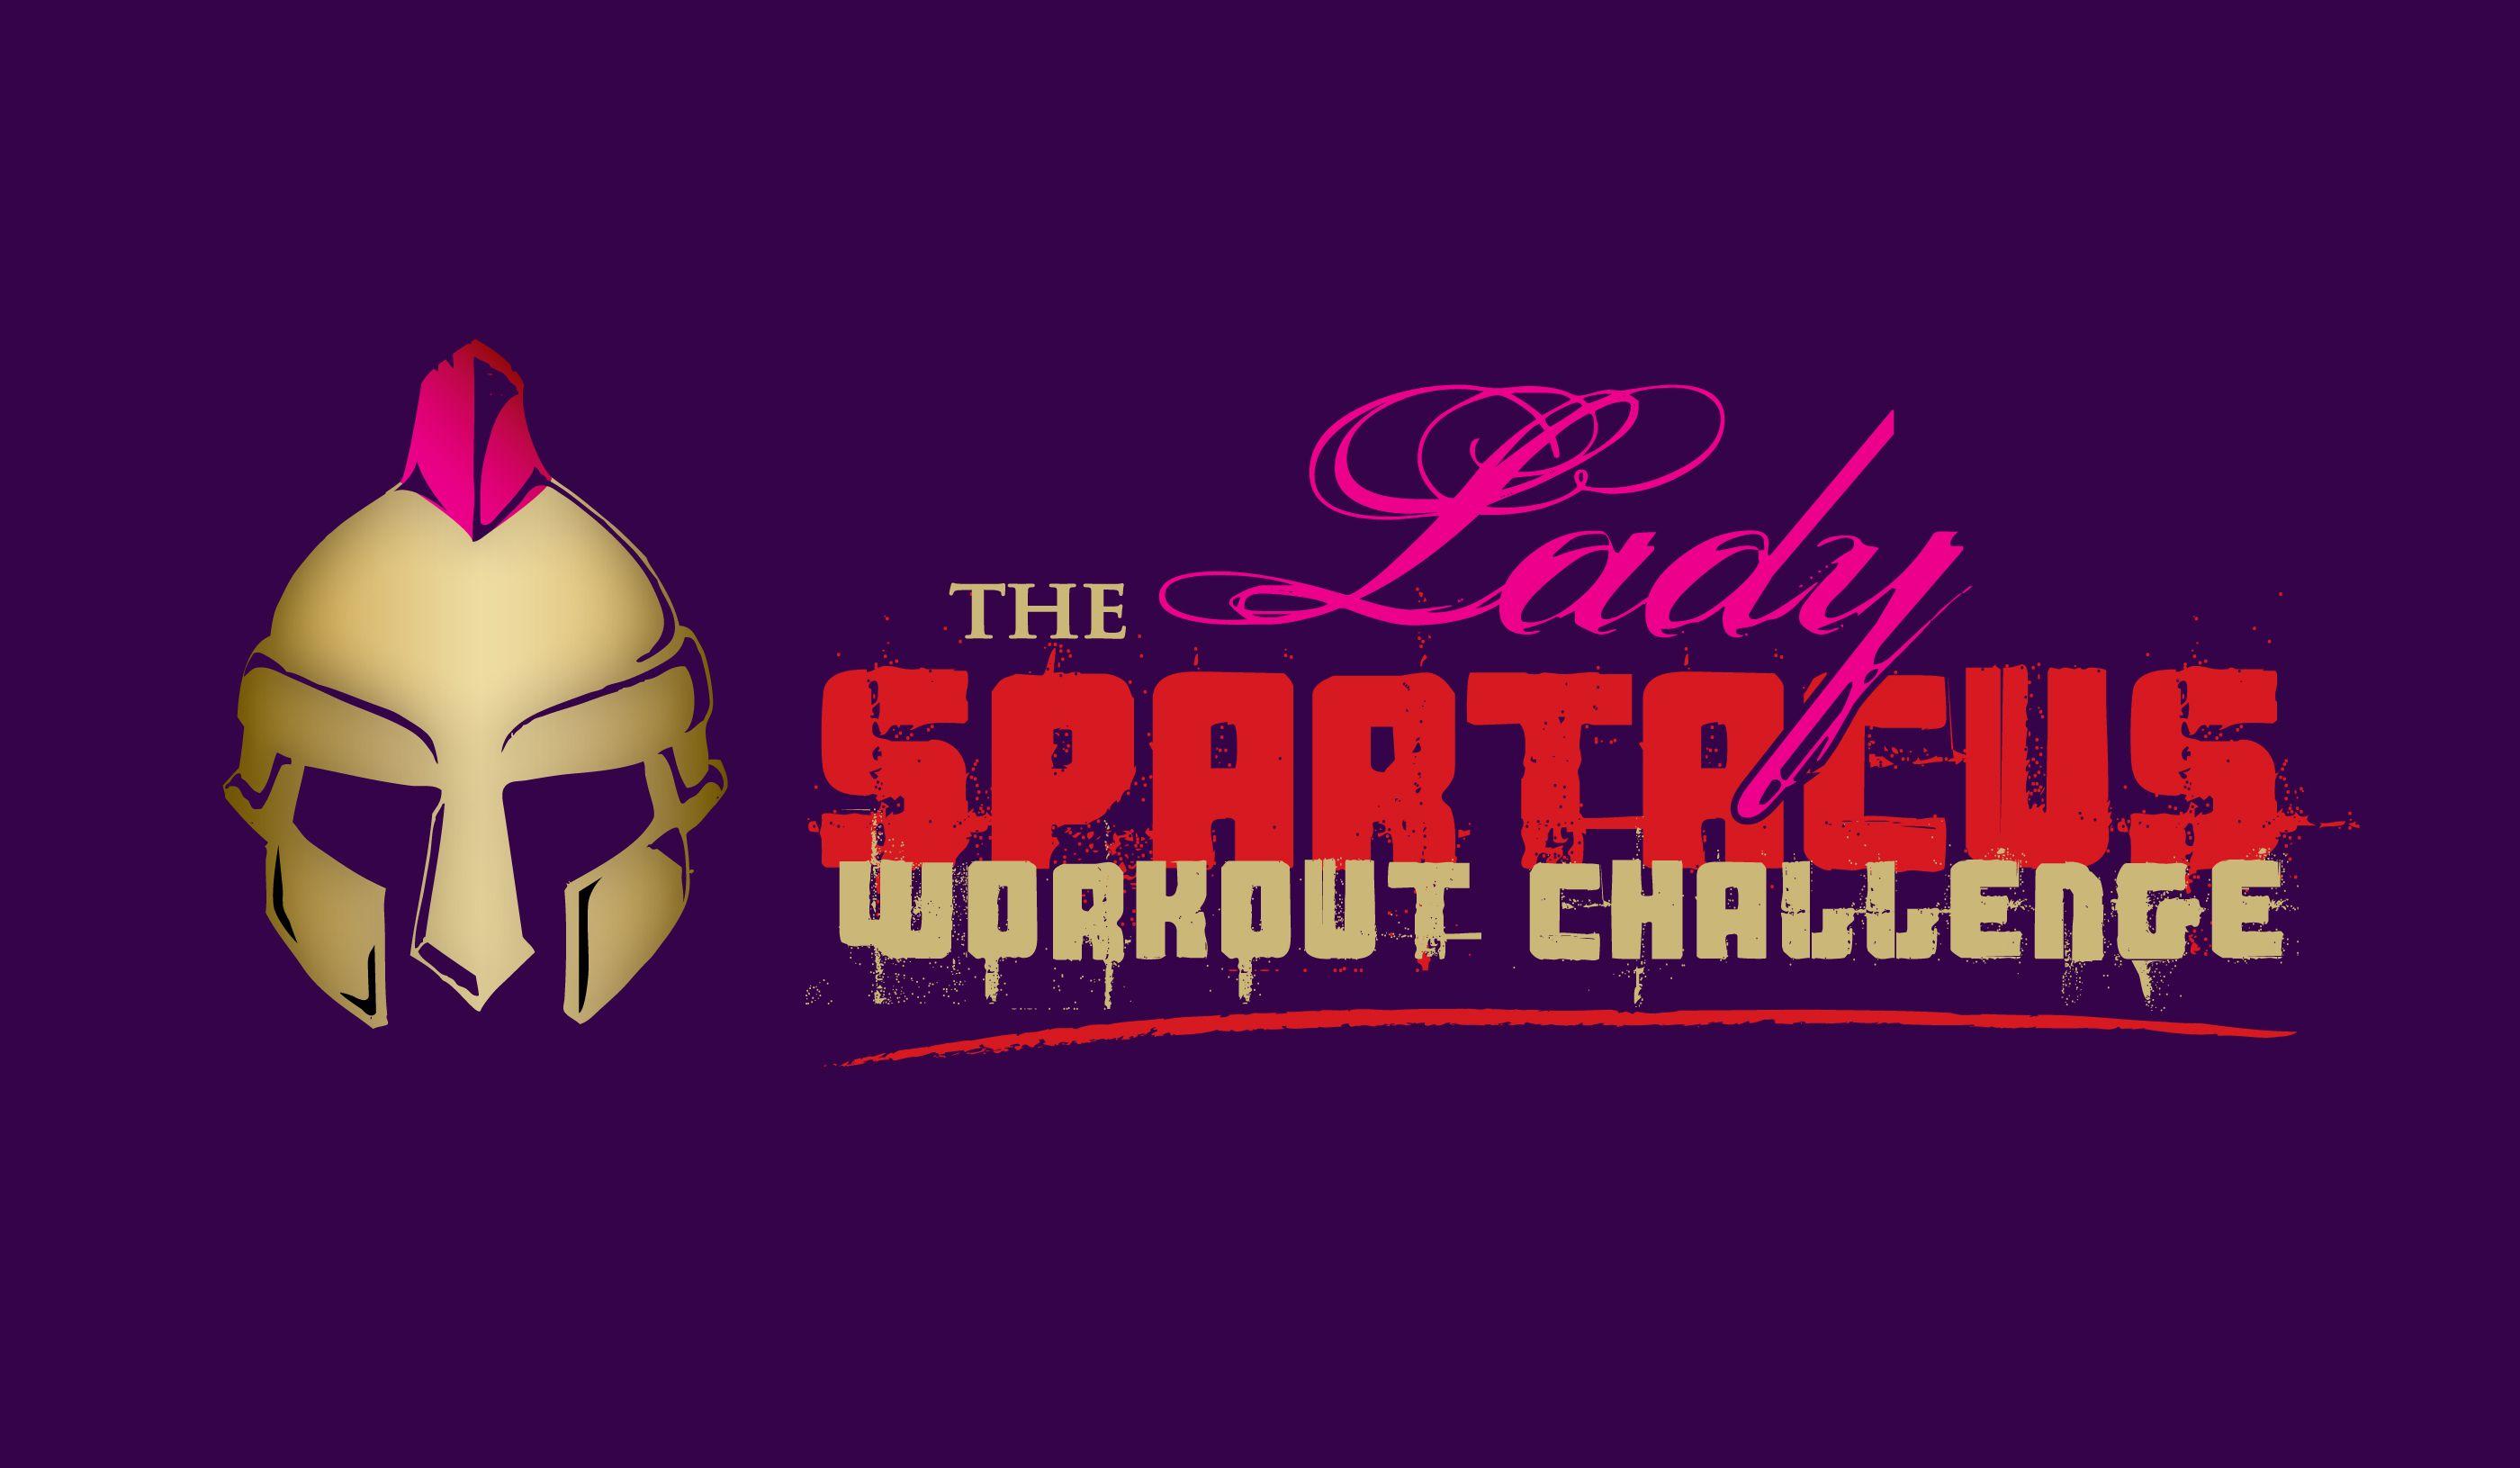 Lady Spartacus logo - http://www.spartacusworkout.com/